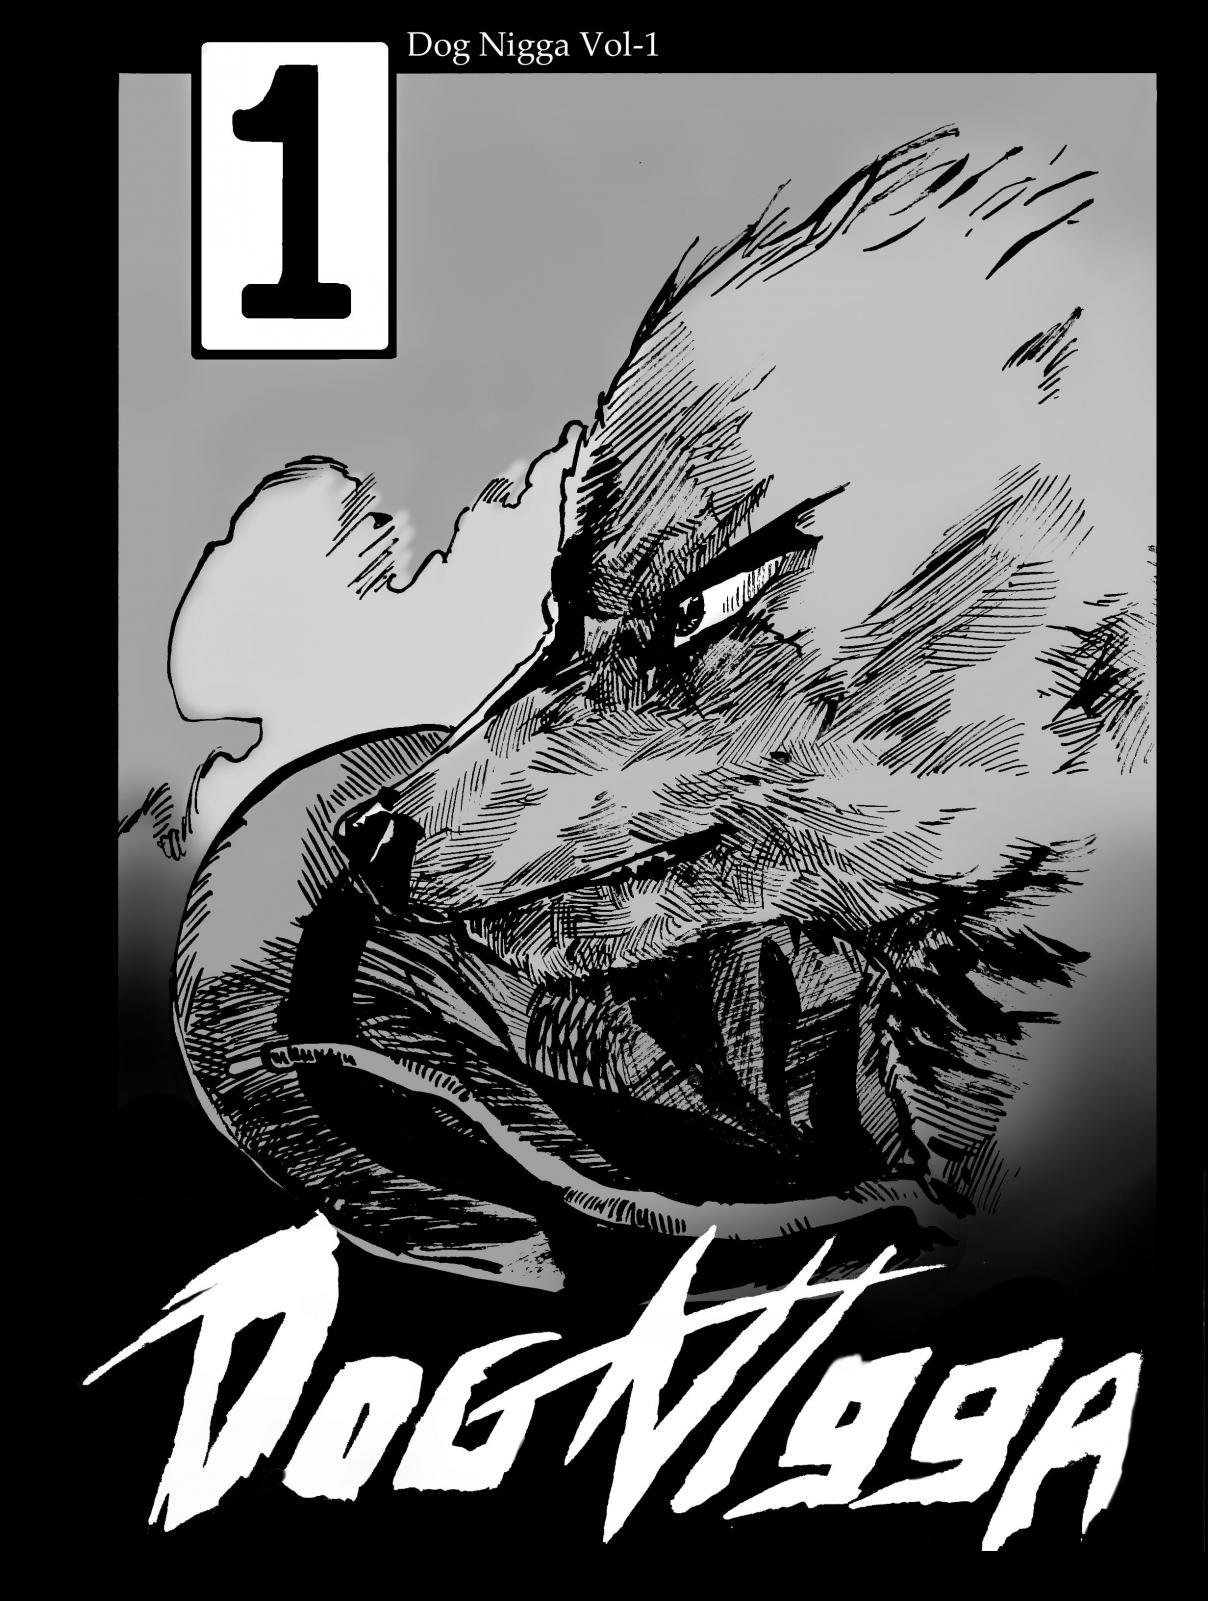 https://nine.mangadogs.com/fr_manga/pic2/57/11385/558867/a20dca2e74f89e00176b027012317173.jpg Page 2